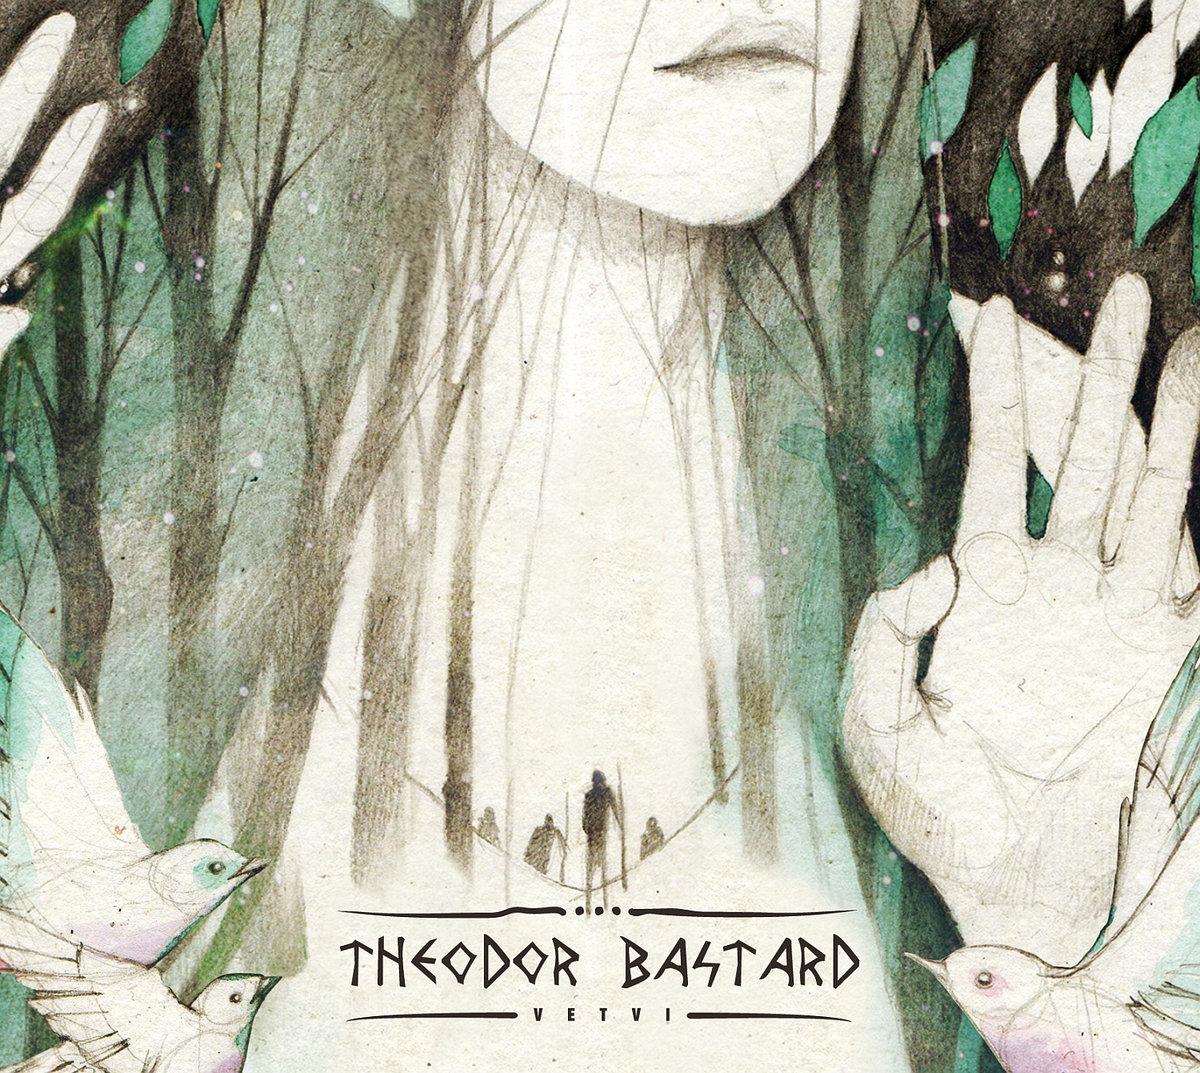 Theodor Bastard